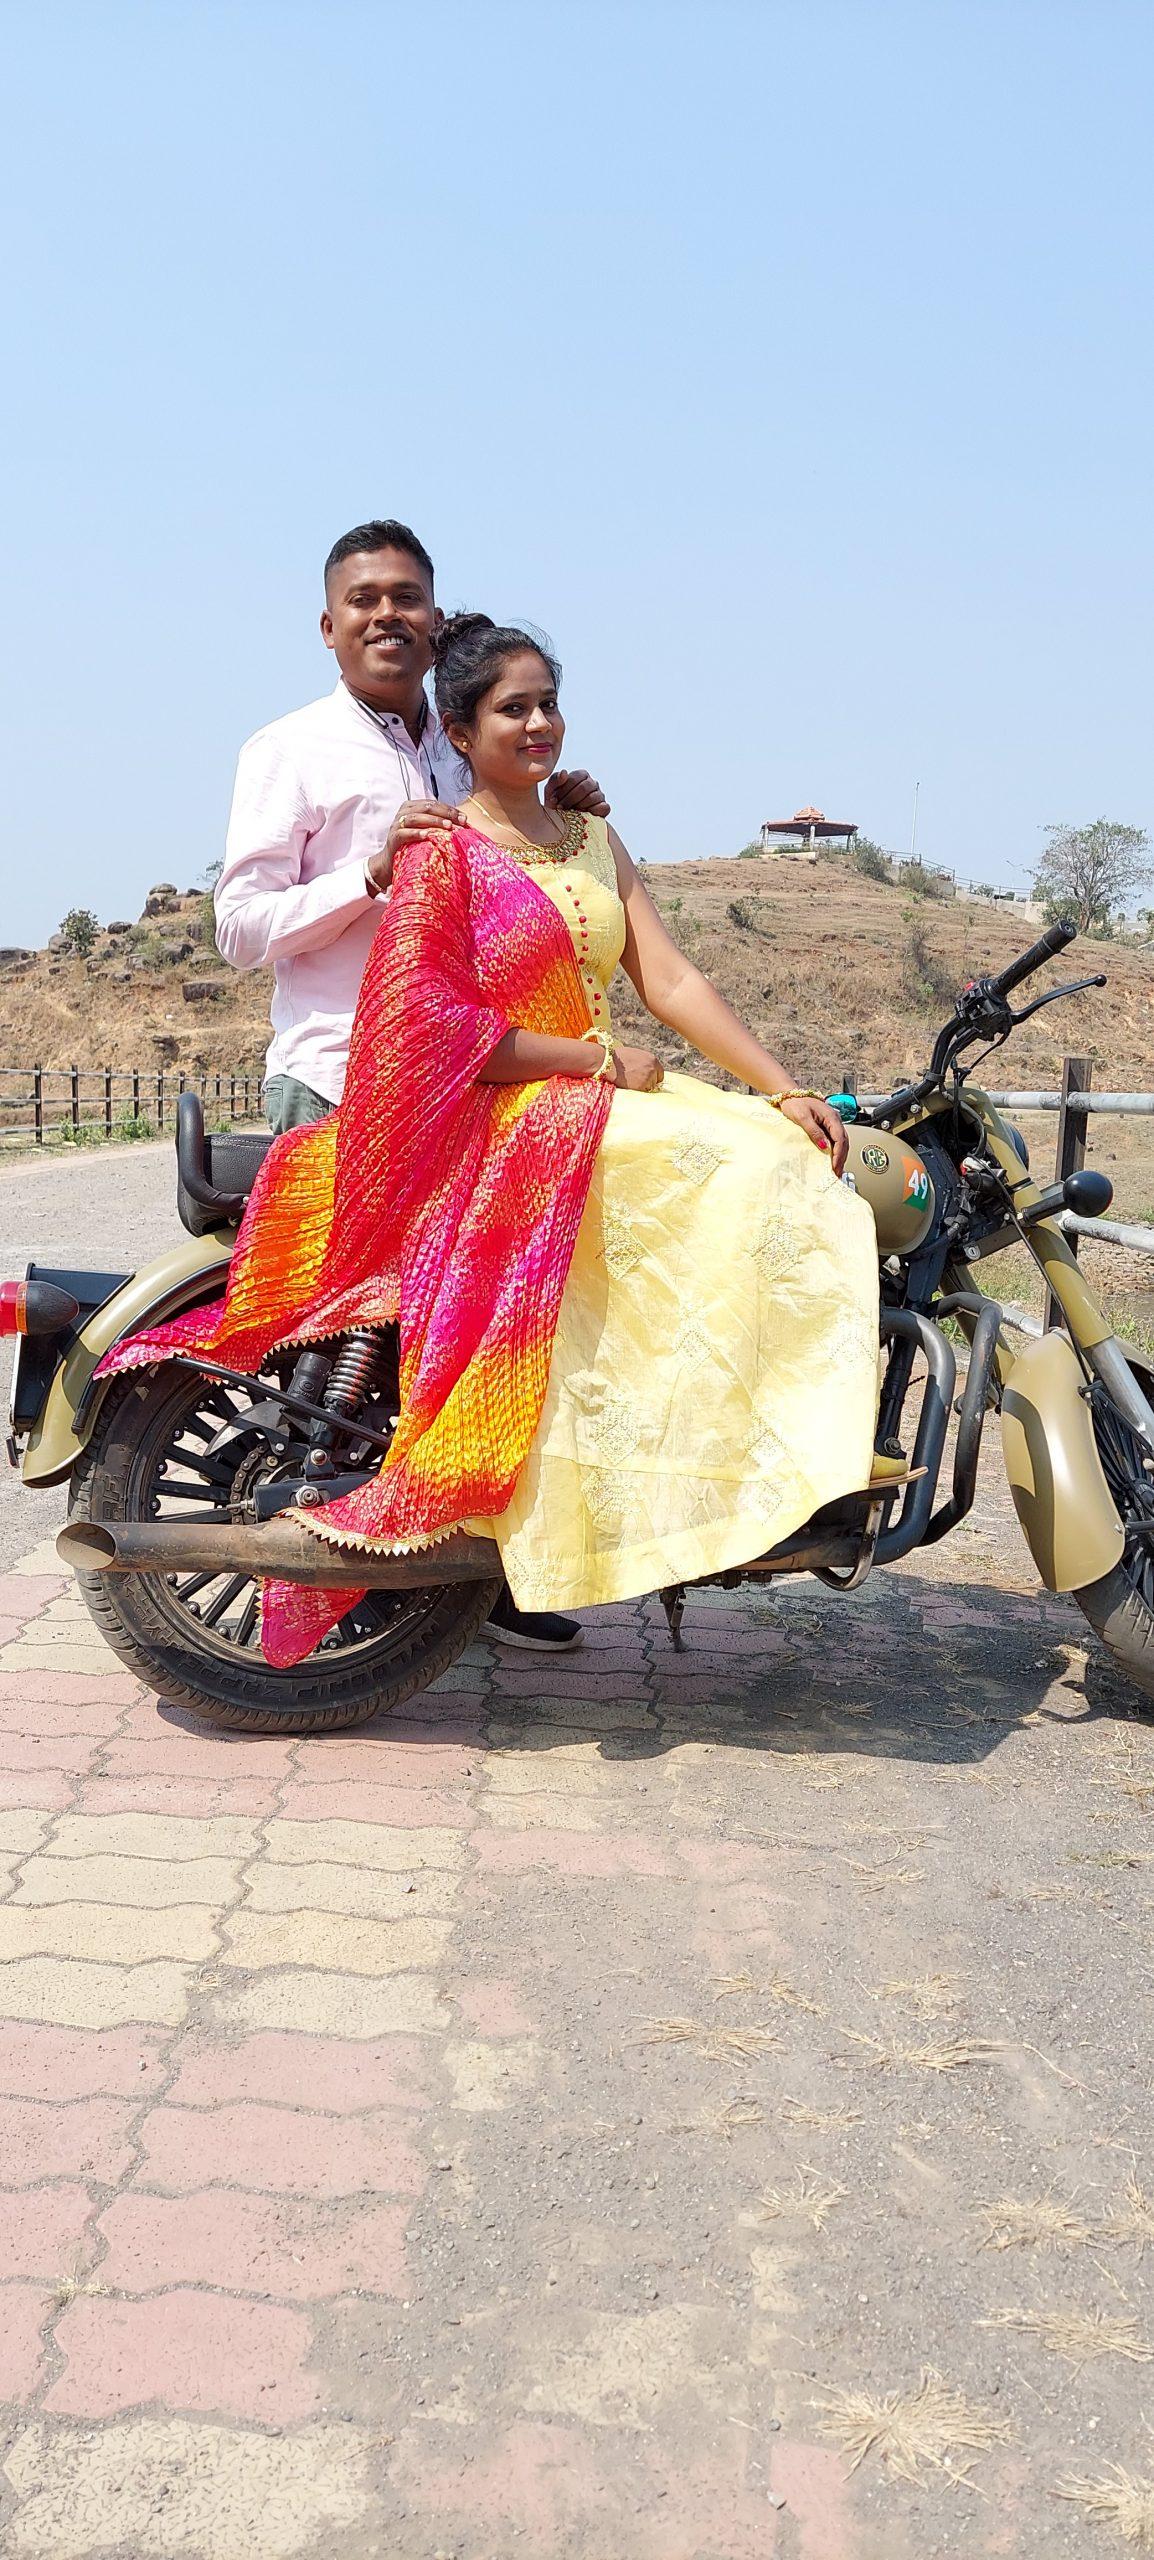 Couple posing on Royal Enfield bike